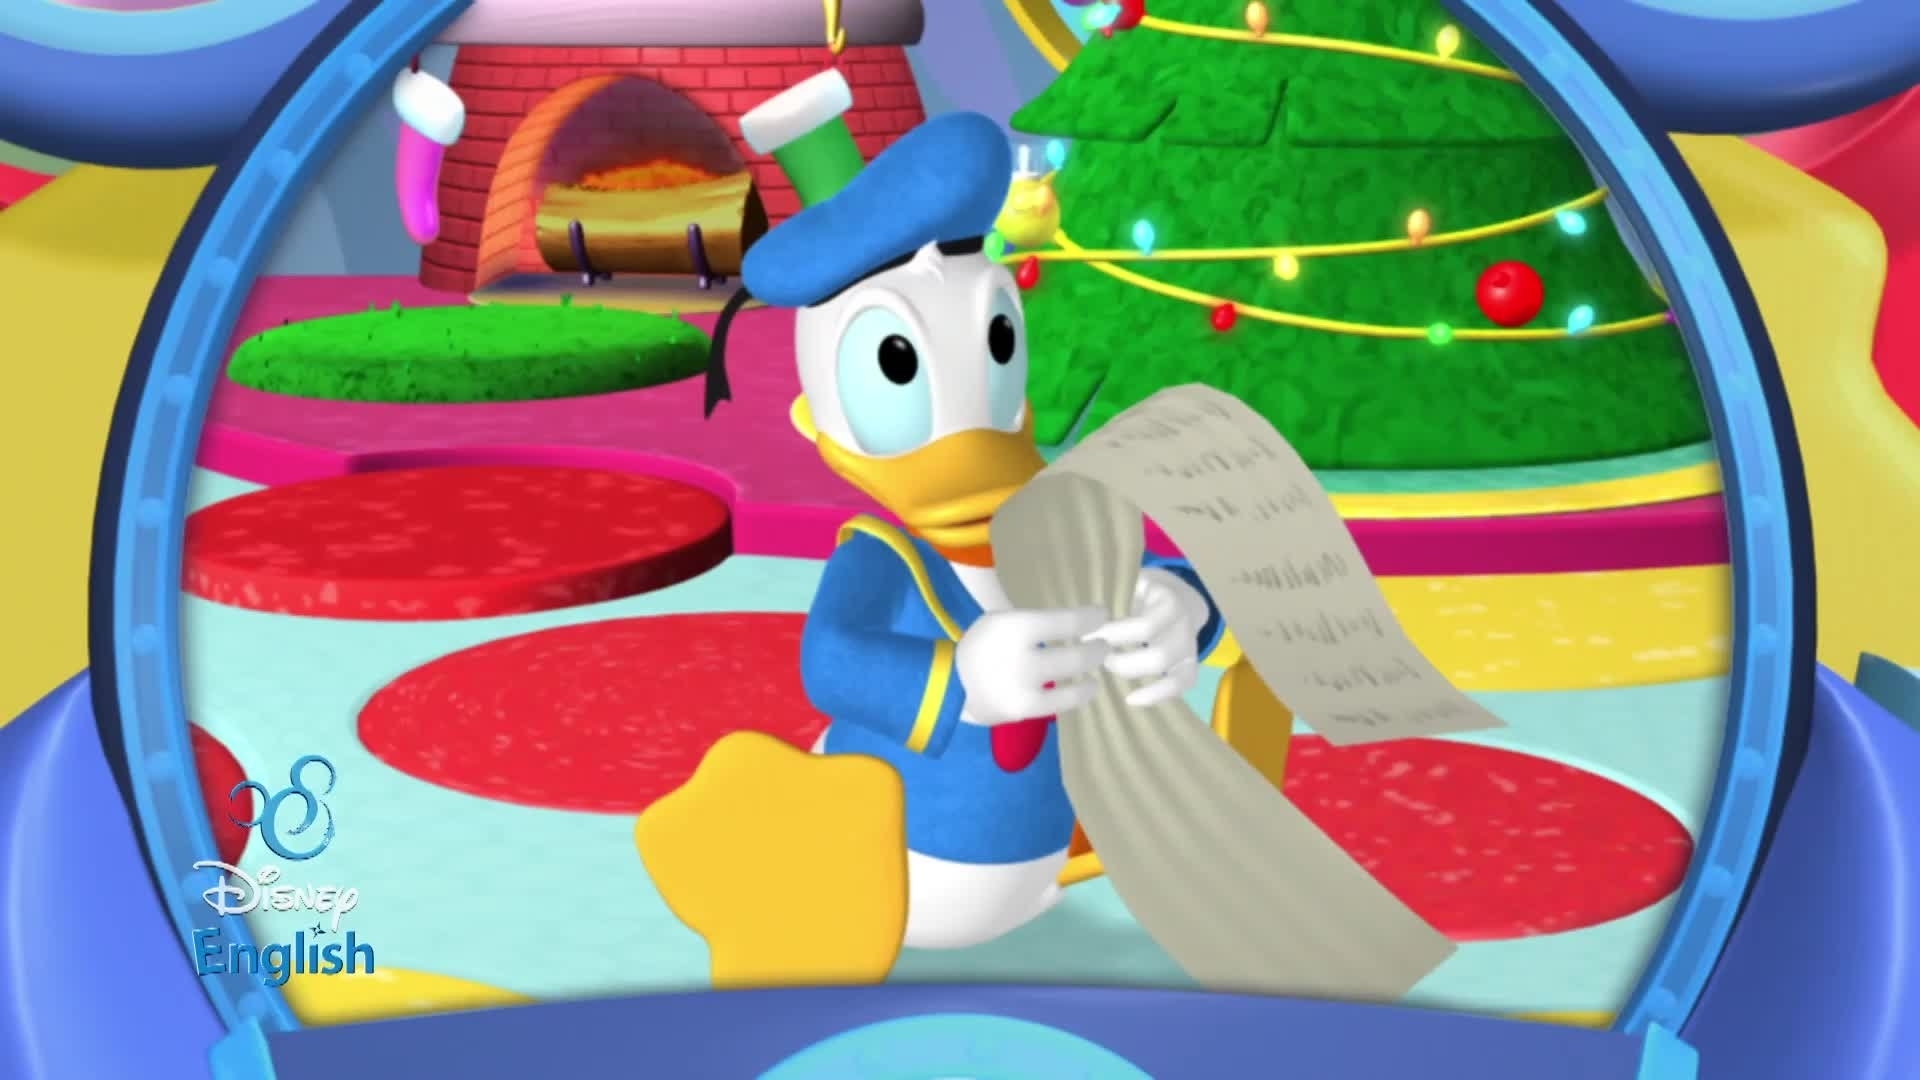 Disney English - La liste de Noël de Donald